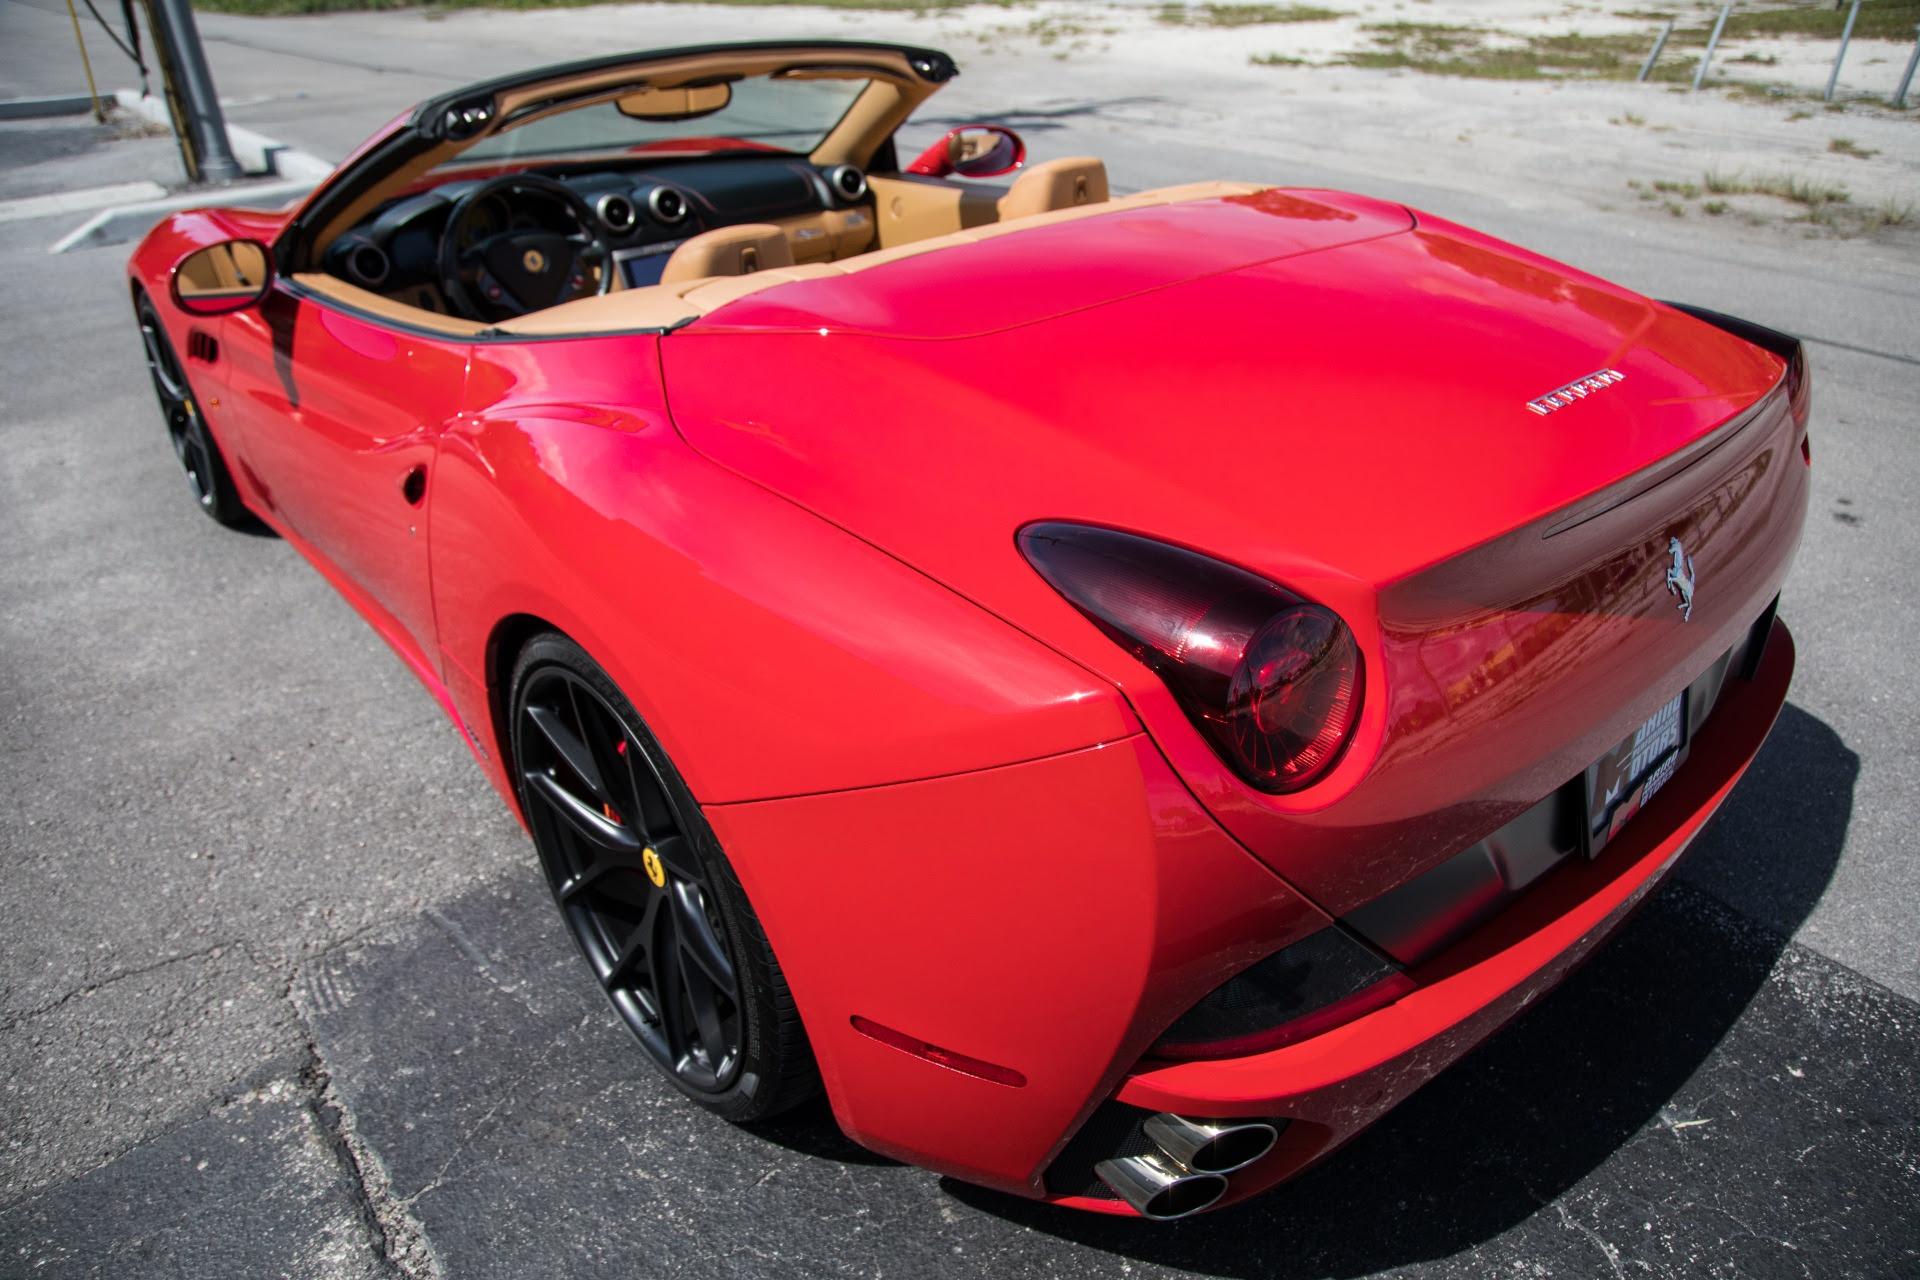 Used 2010 Ferrari California For Sale ($104,900)   Marino ...